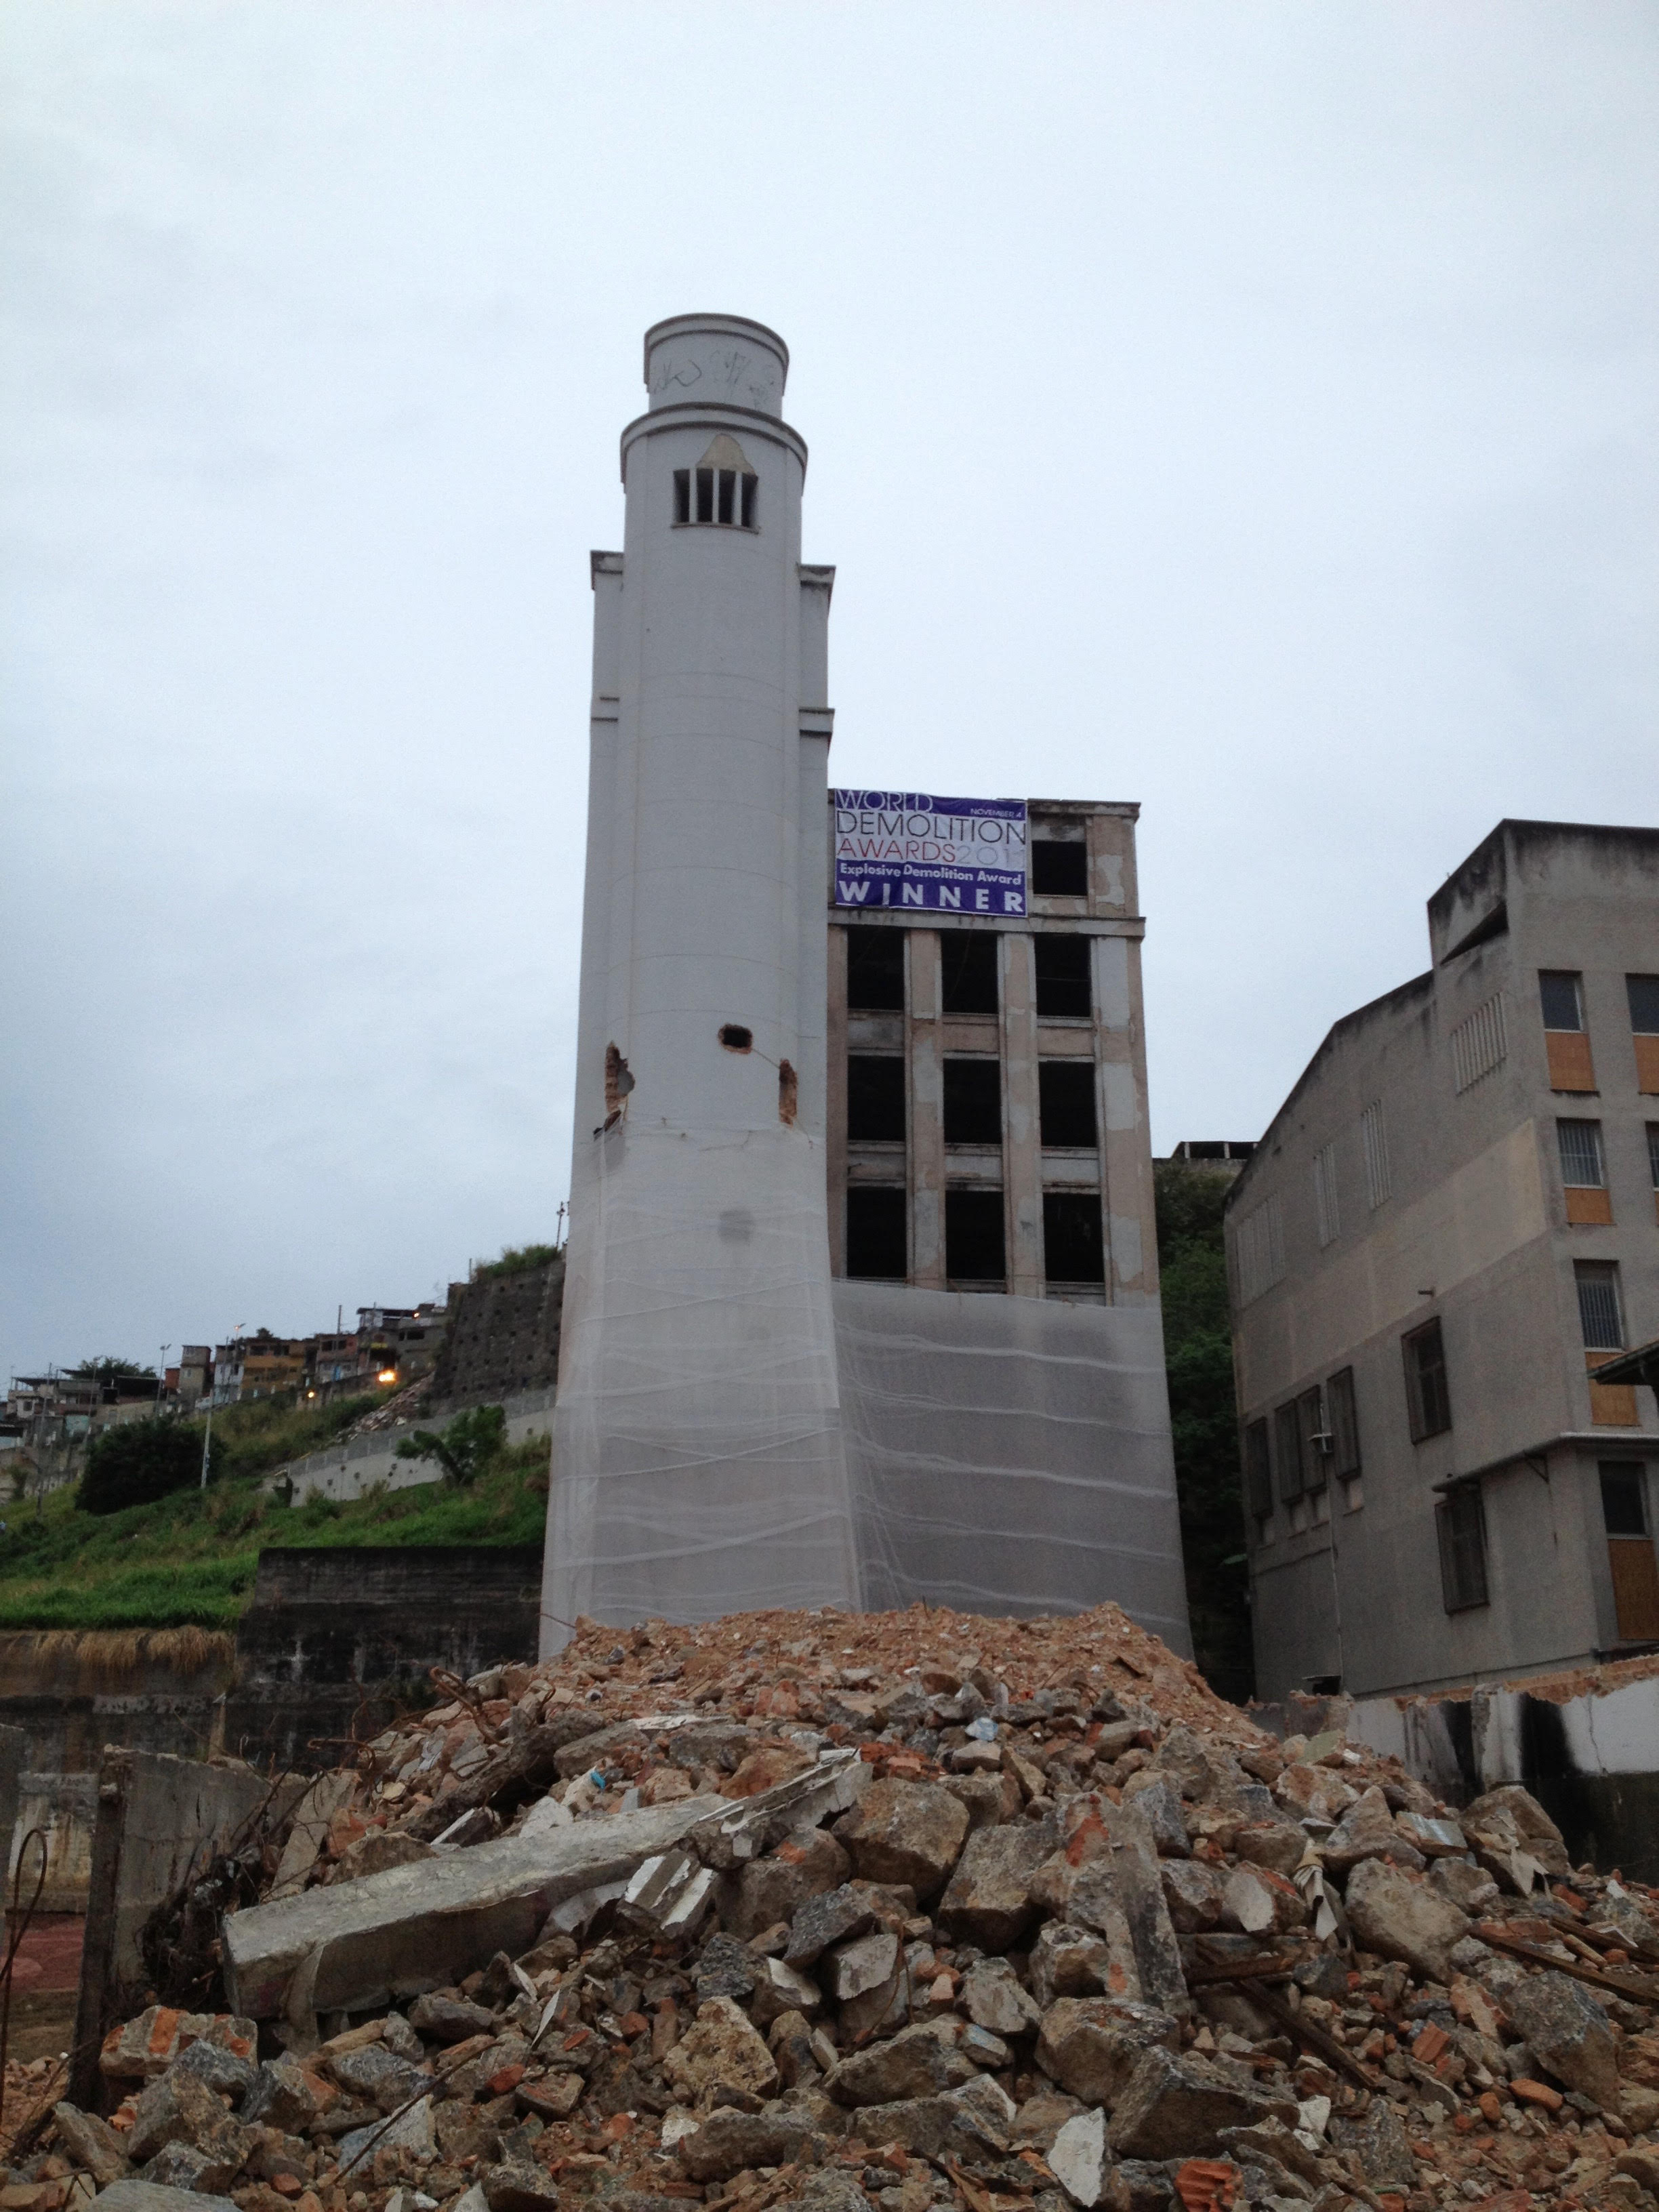 Fabio Bruno USA - Manchete Building - Implosion.jpg